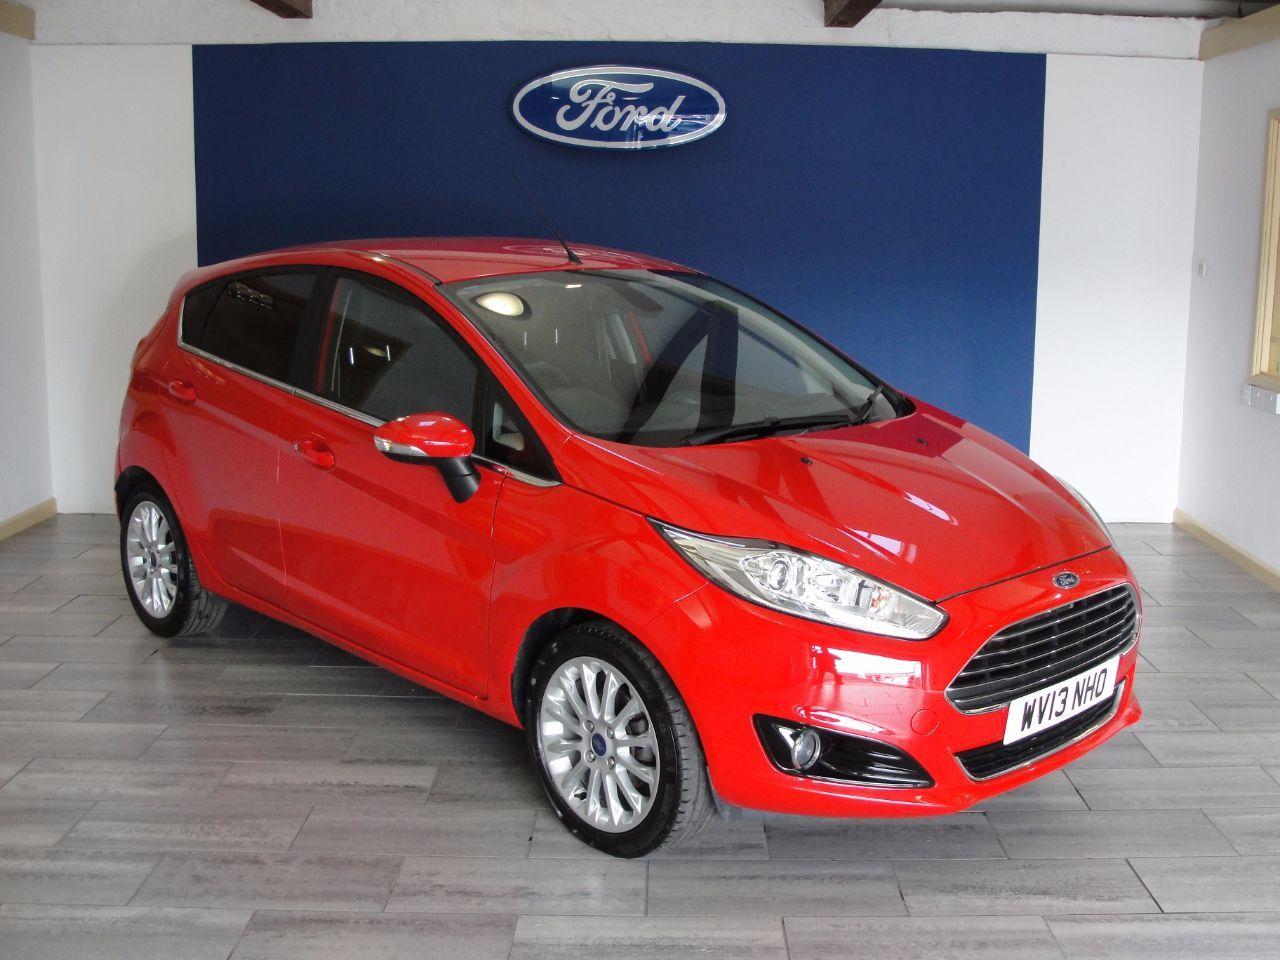 Ford Fiesta 1 0 Ecoboost Titanium X 5dr Hatchback Petrol Red